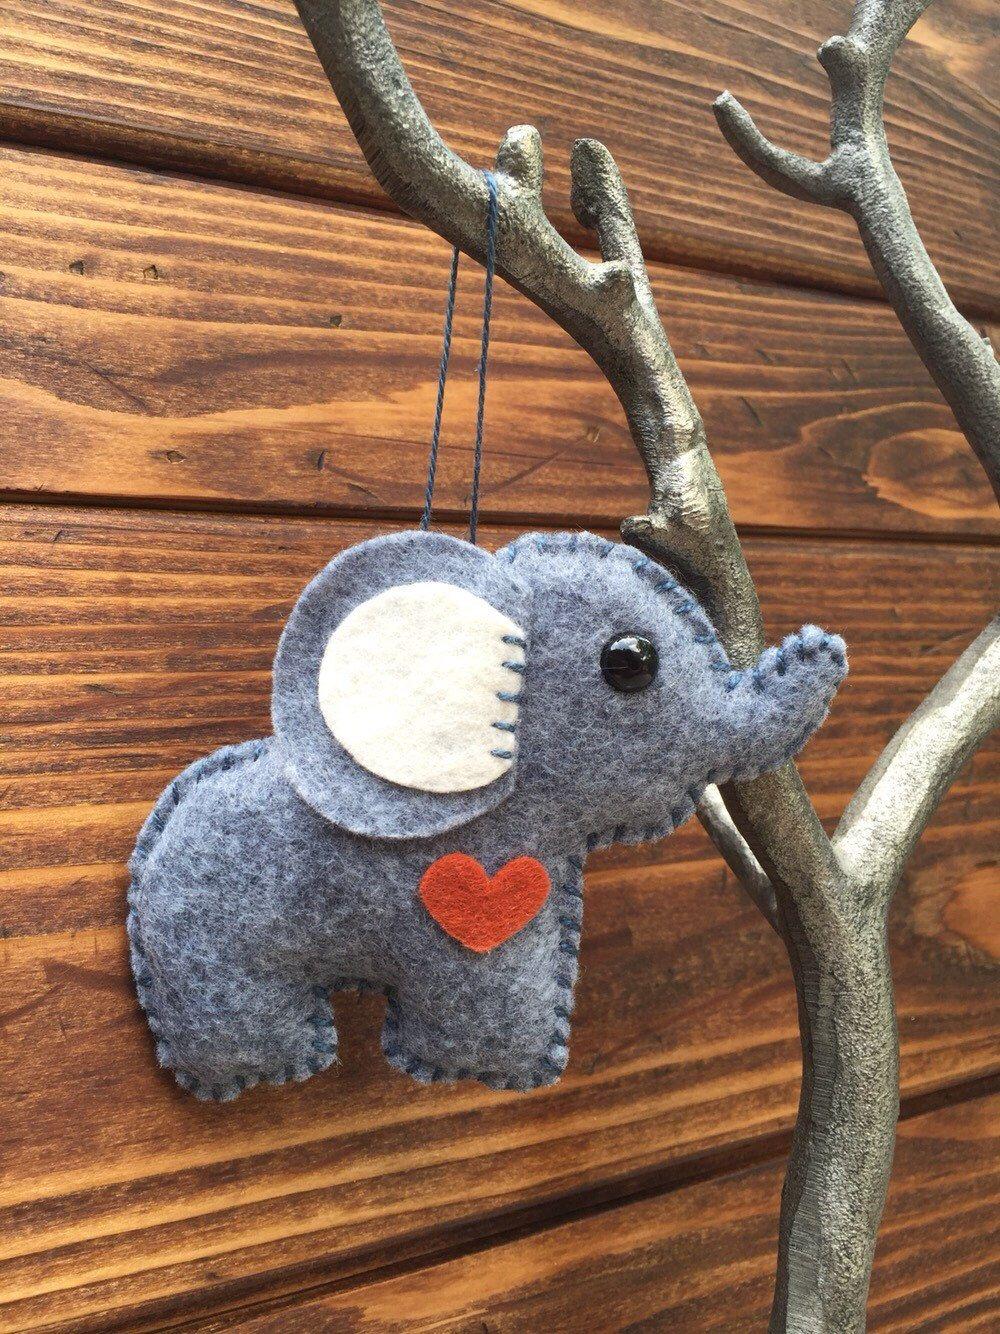 Wool felt ornaments - Wool Felt Elephant Christmas Ornament Keychain Mobile Attachment Car Mirror Ornament Plush Toy Stuffie Cloudy Day